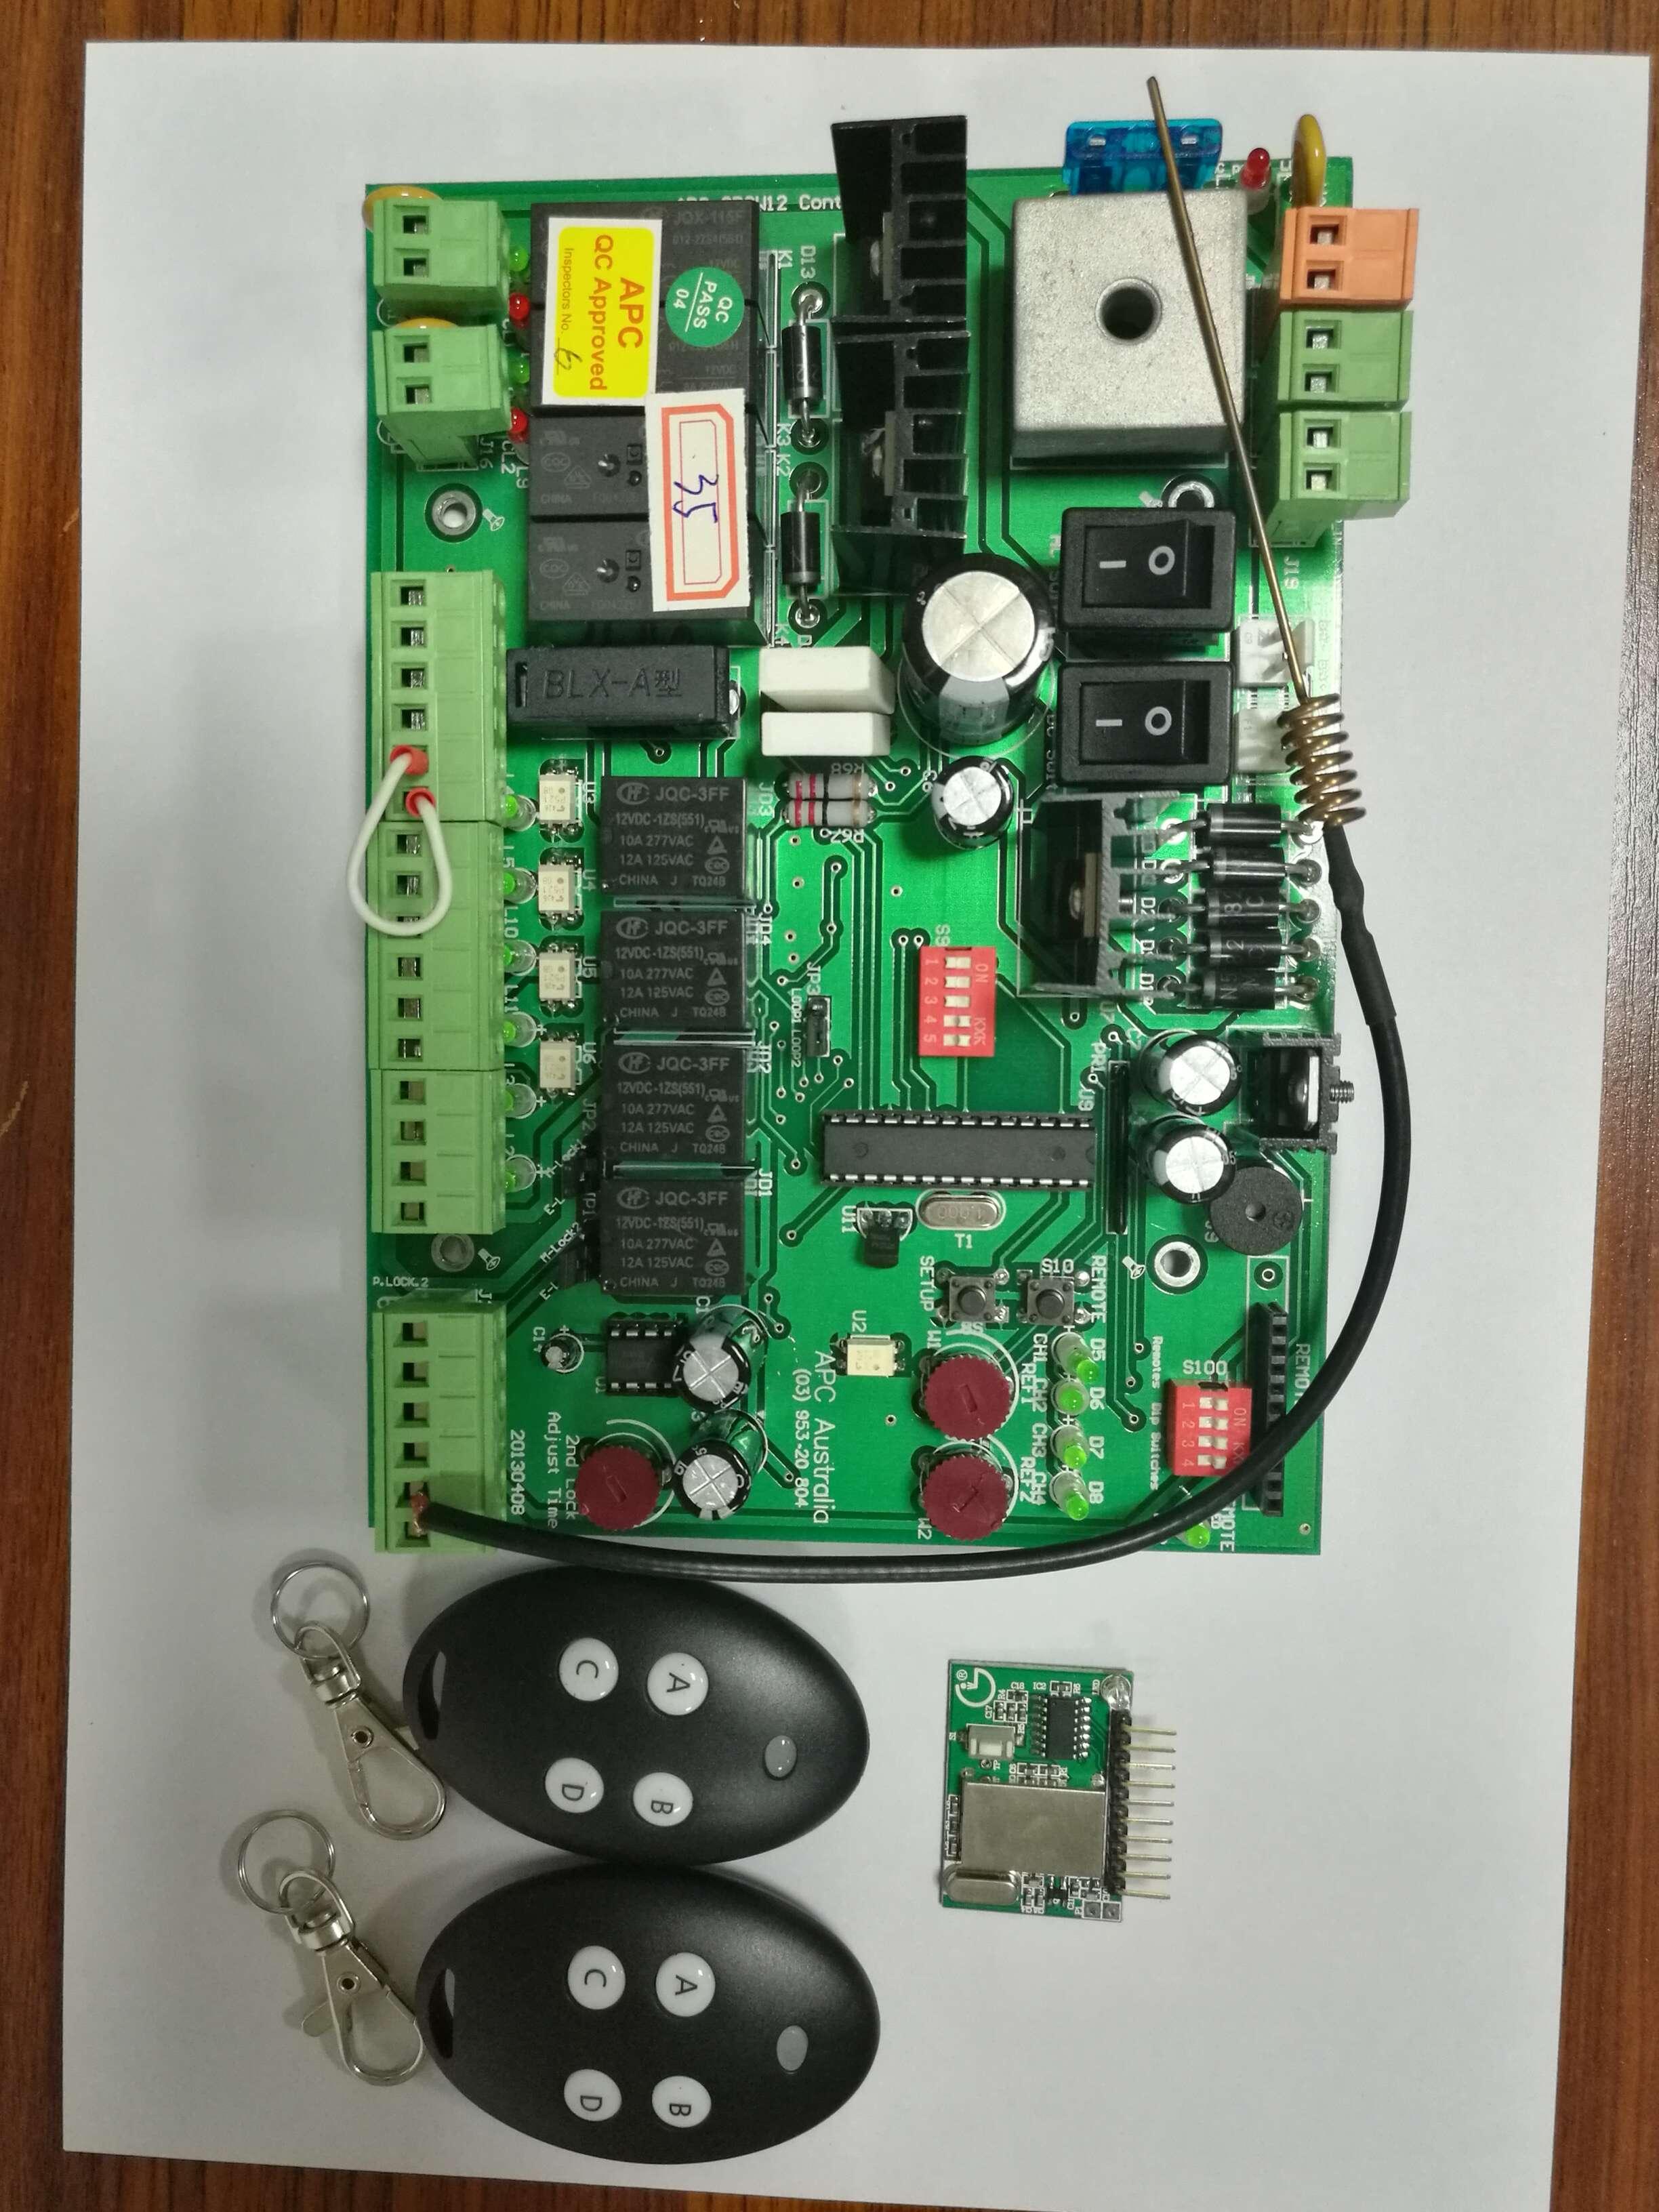 24v 12V Dc Swing Gate Opener DC Motor Control Unit PCB Controller Circuit Board